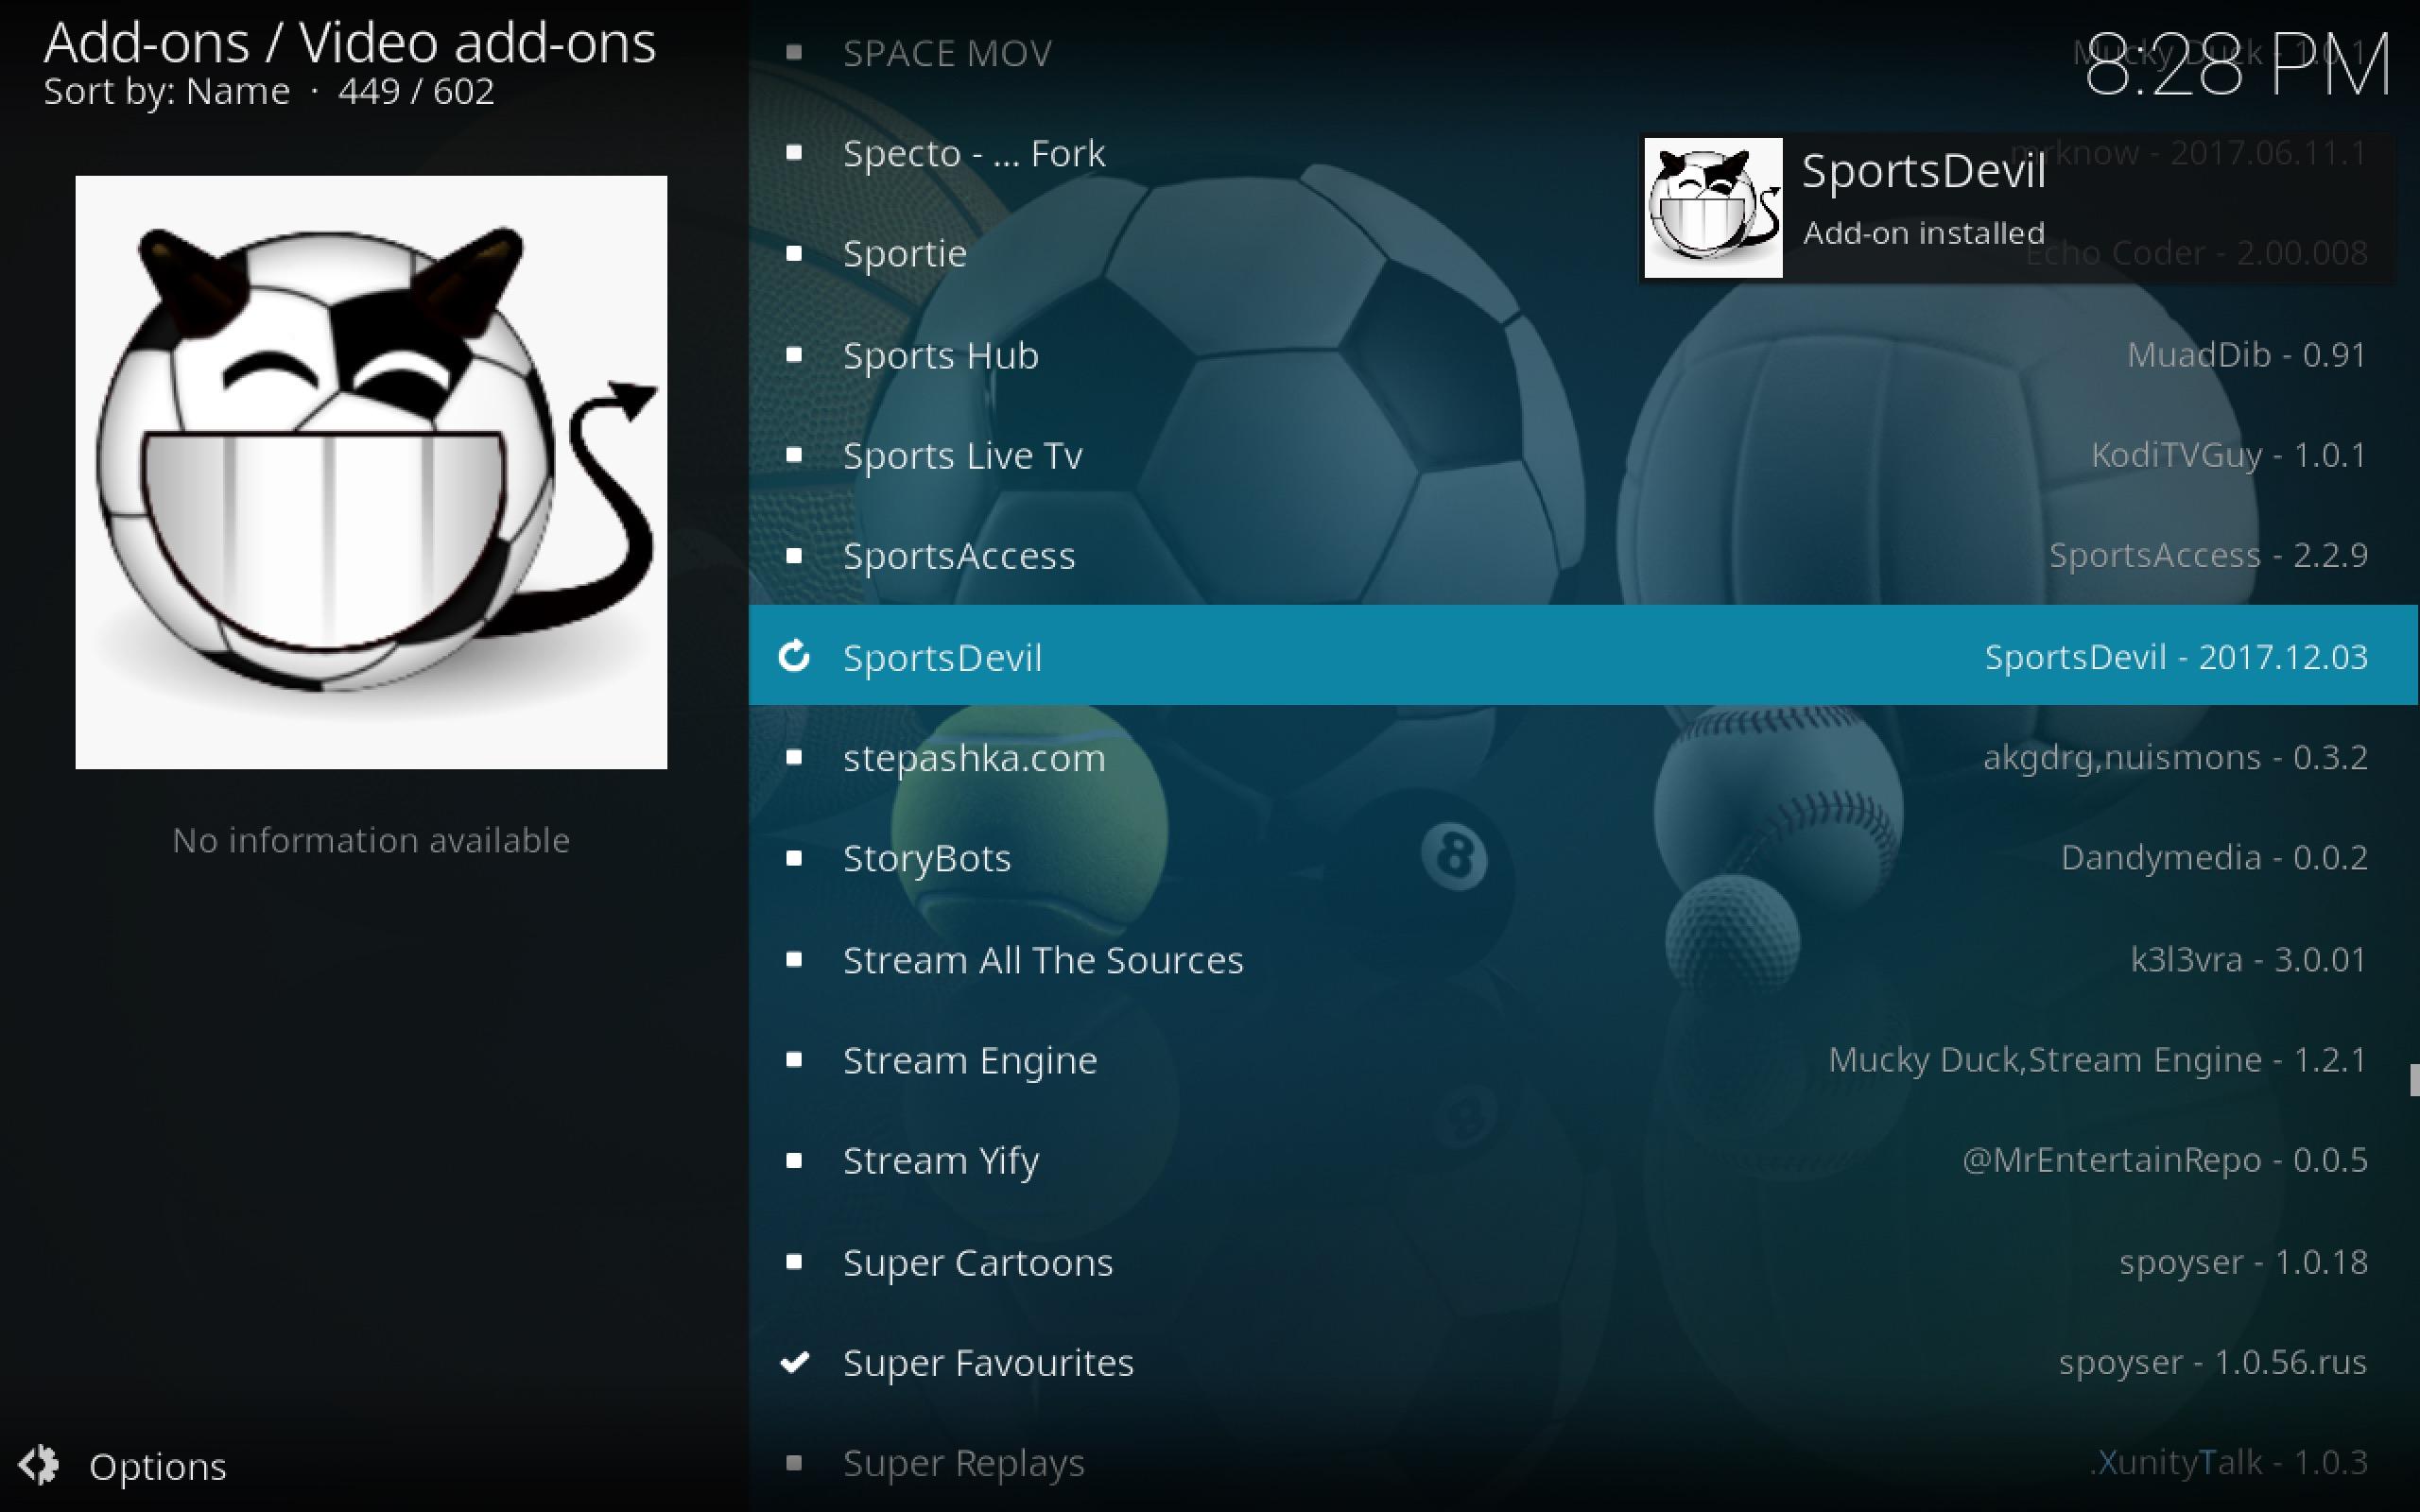 Sportsdevil add-on installed